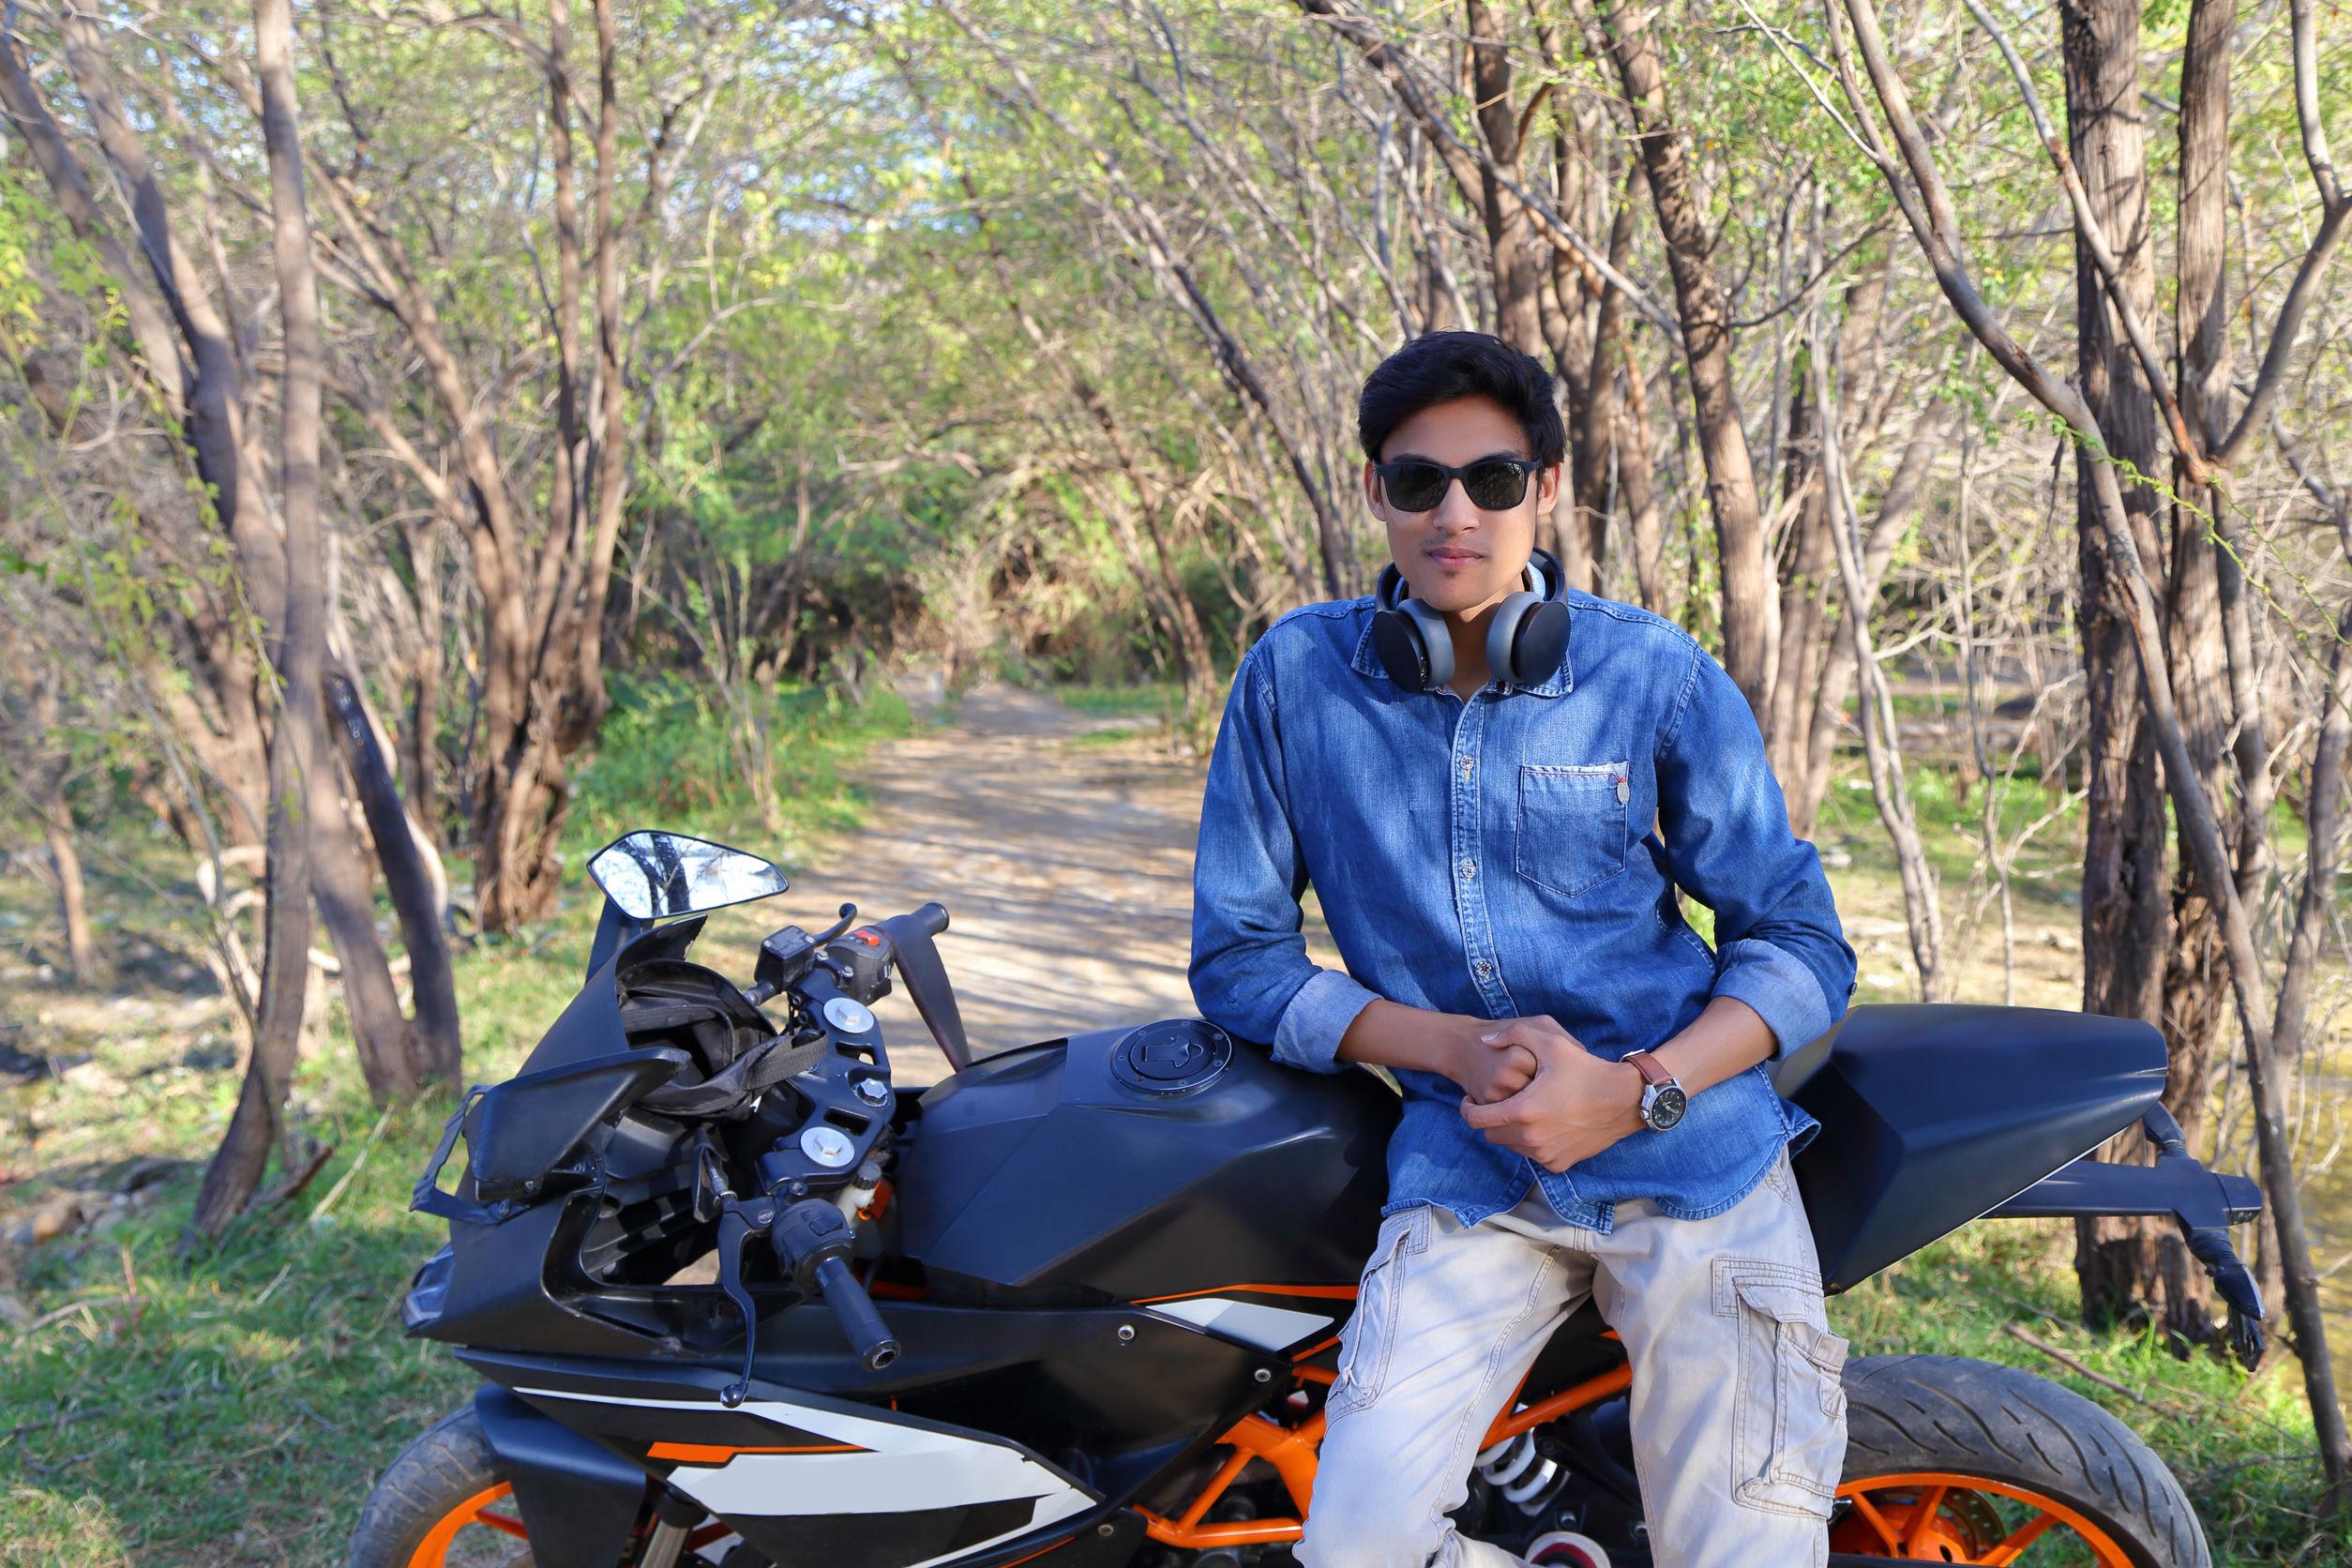 wear headphones on a motorcycle